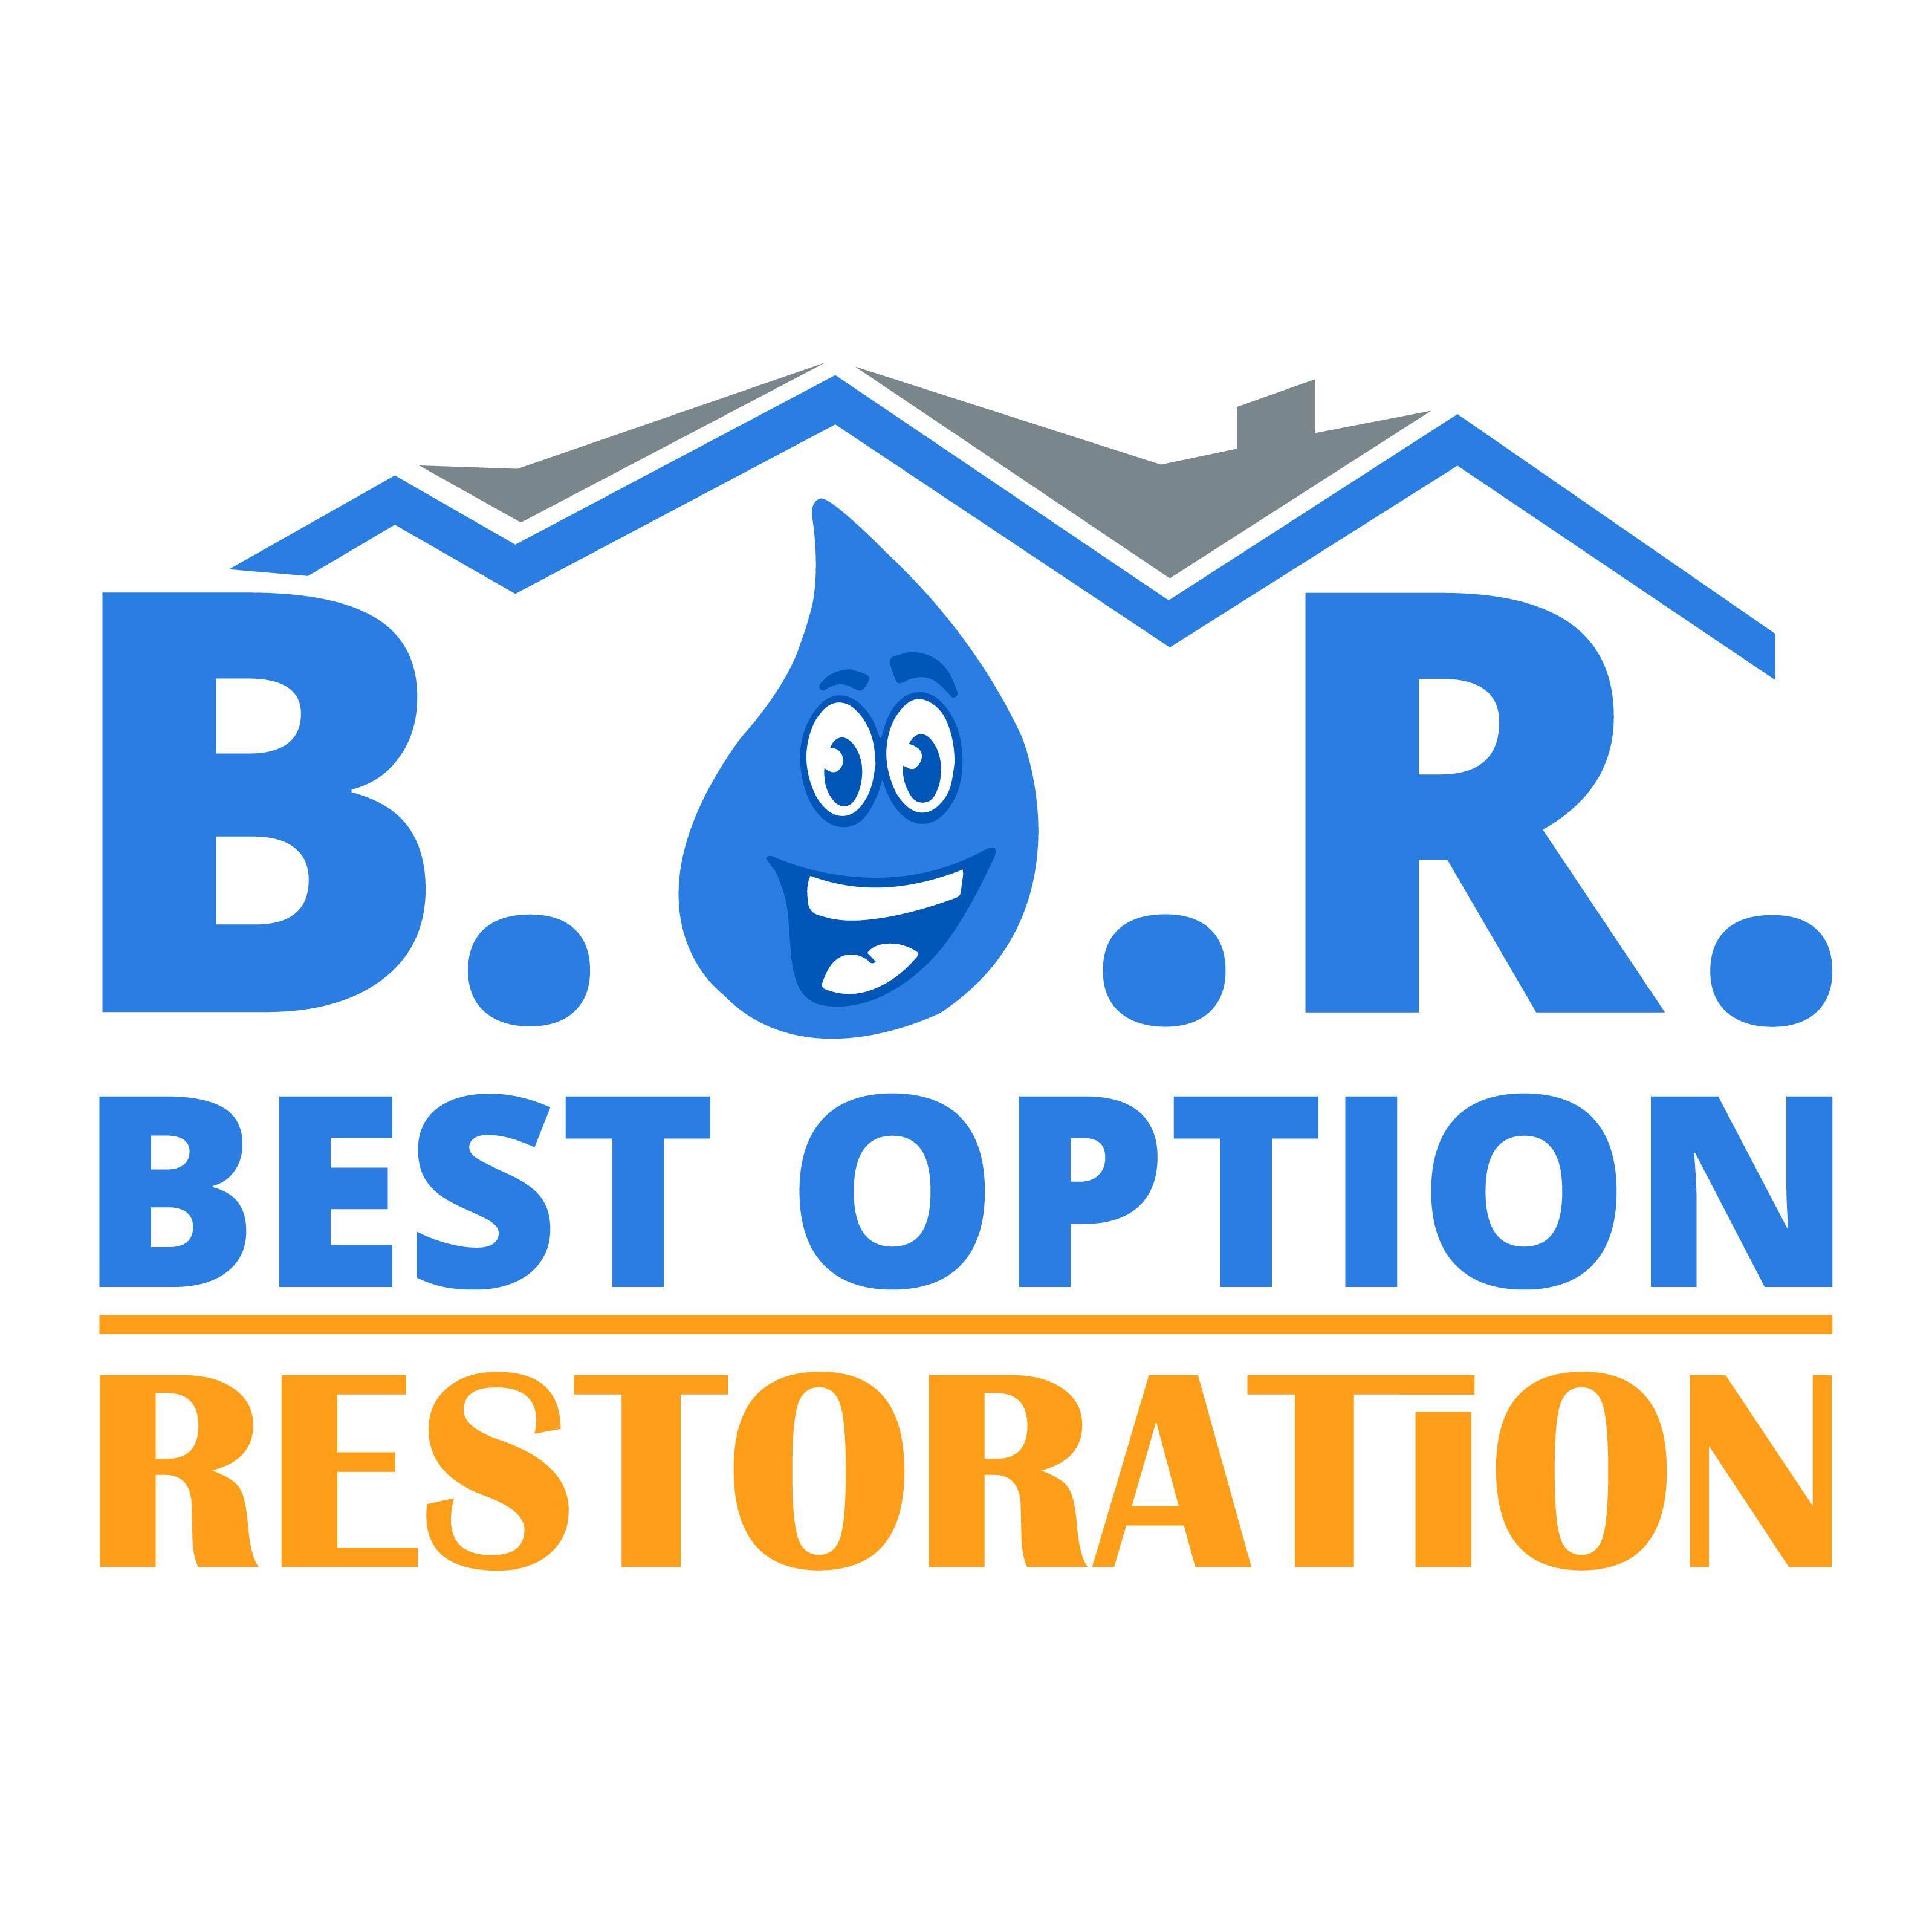 Best Option Restoration - Moorseville - Mooresville, NC 28117 - (704)425-3066 | ShowMeLocal.com